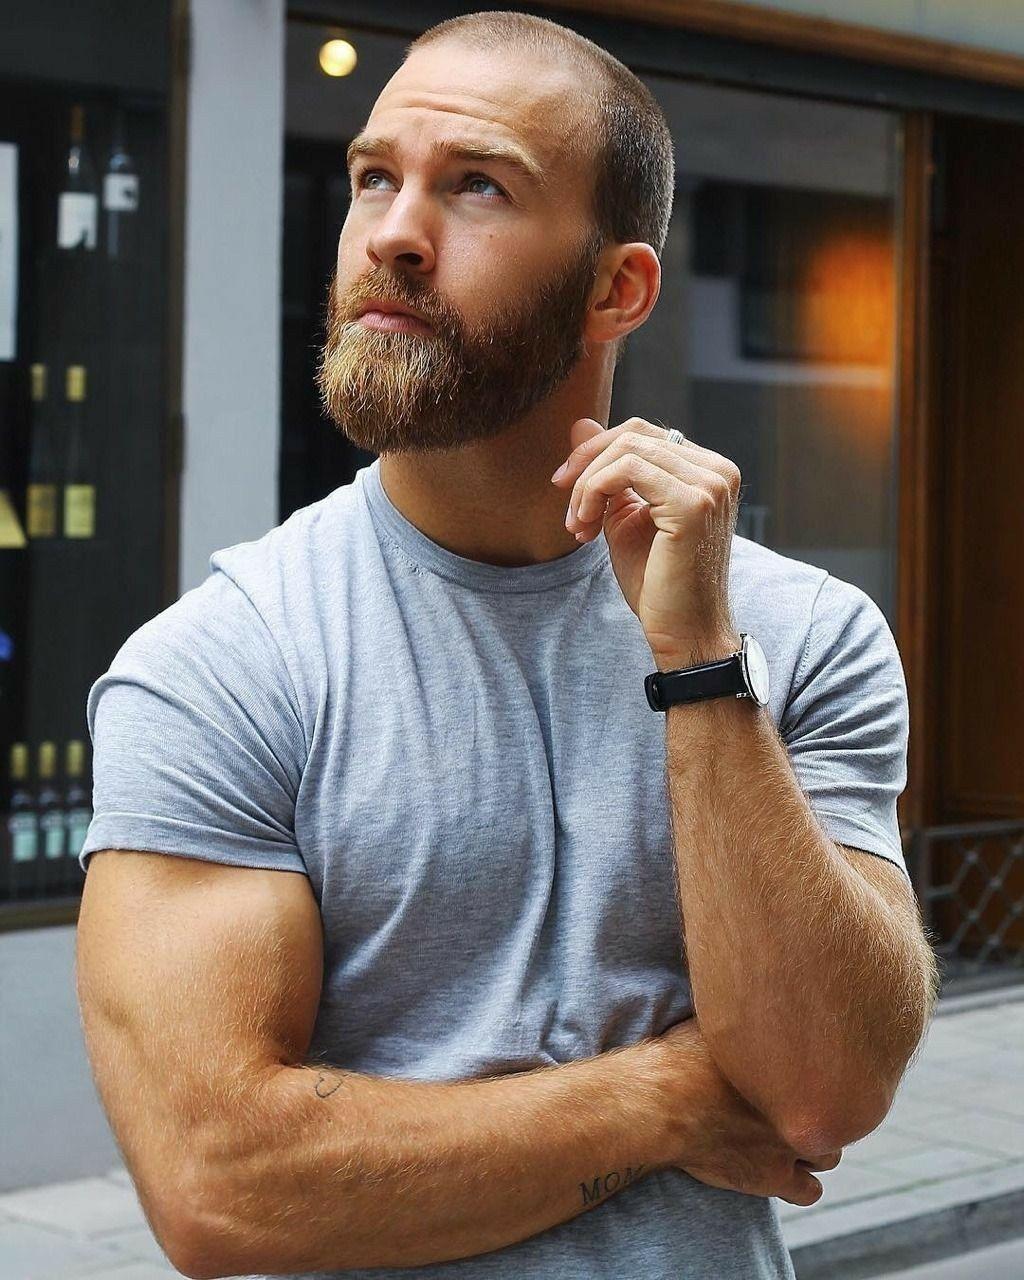 1000 Ideas About Bald Men Styles On Pinterest: #beard #beardrevered